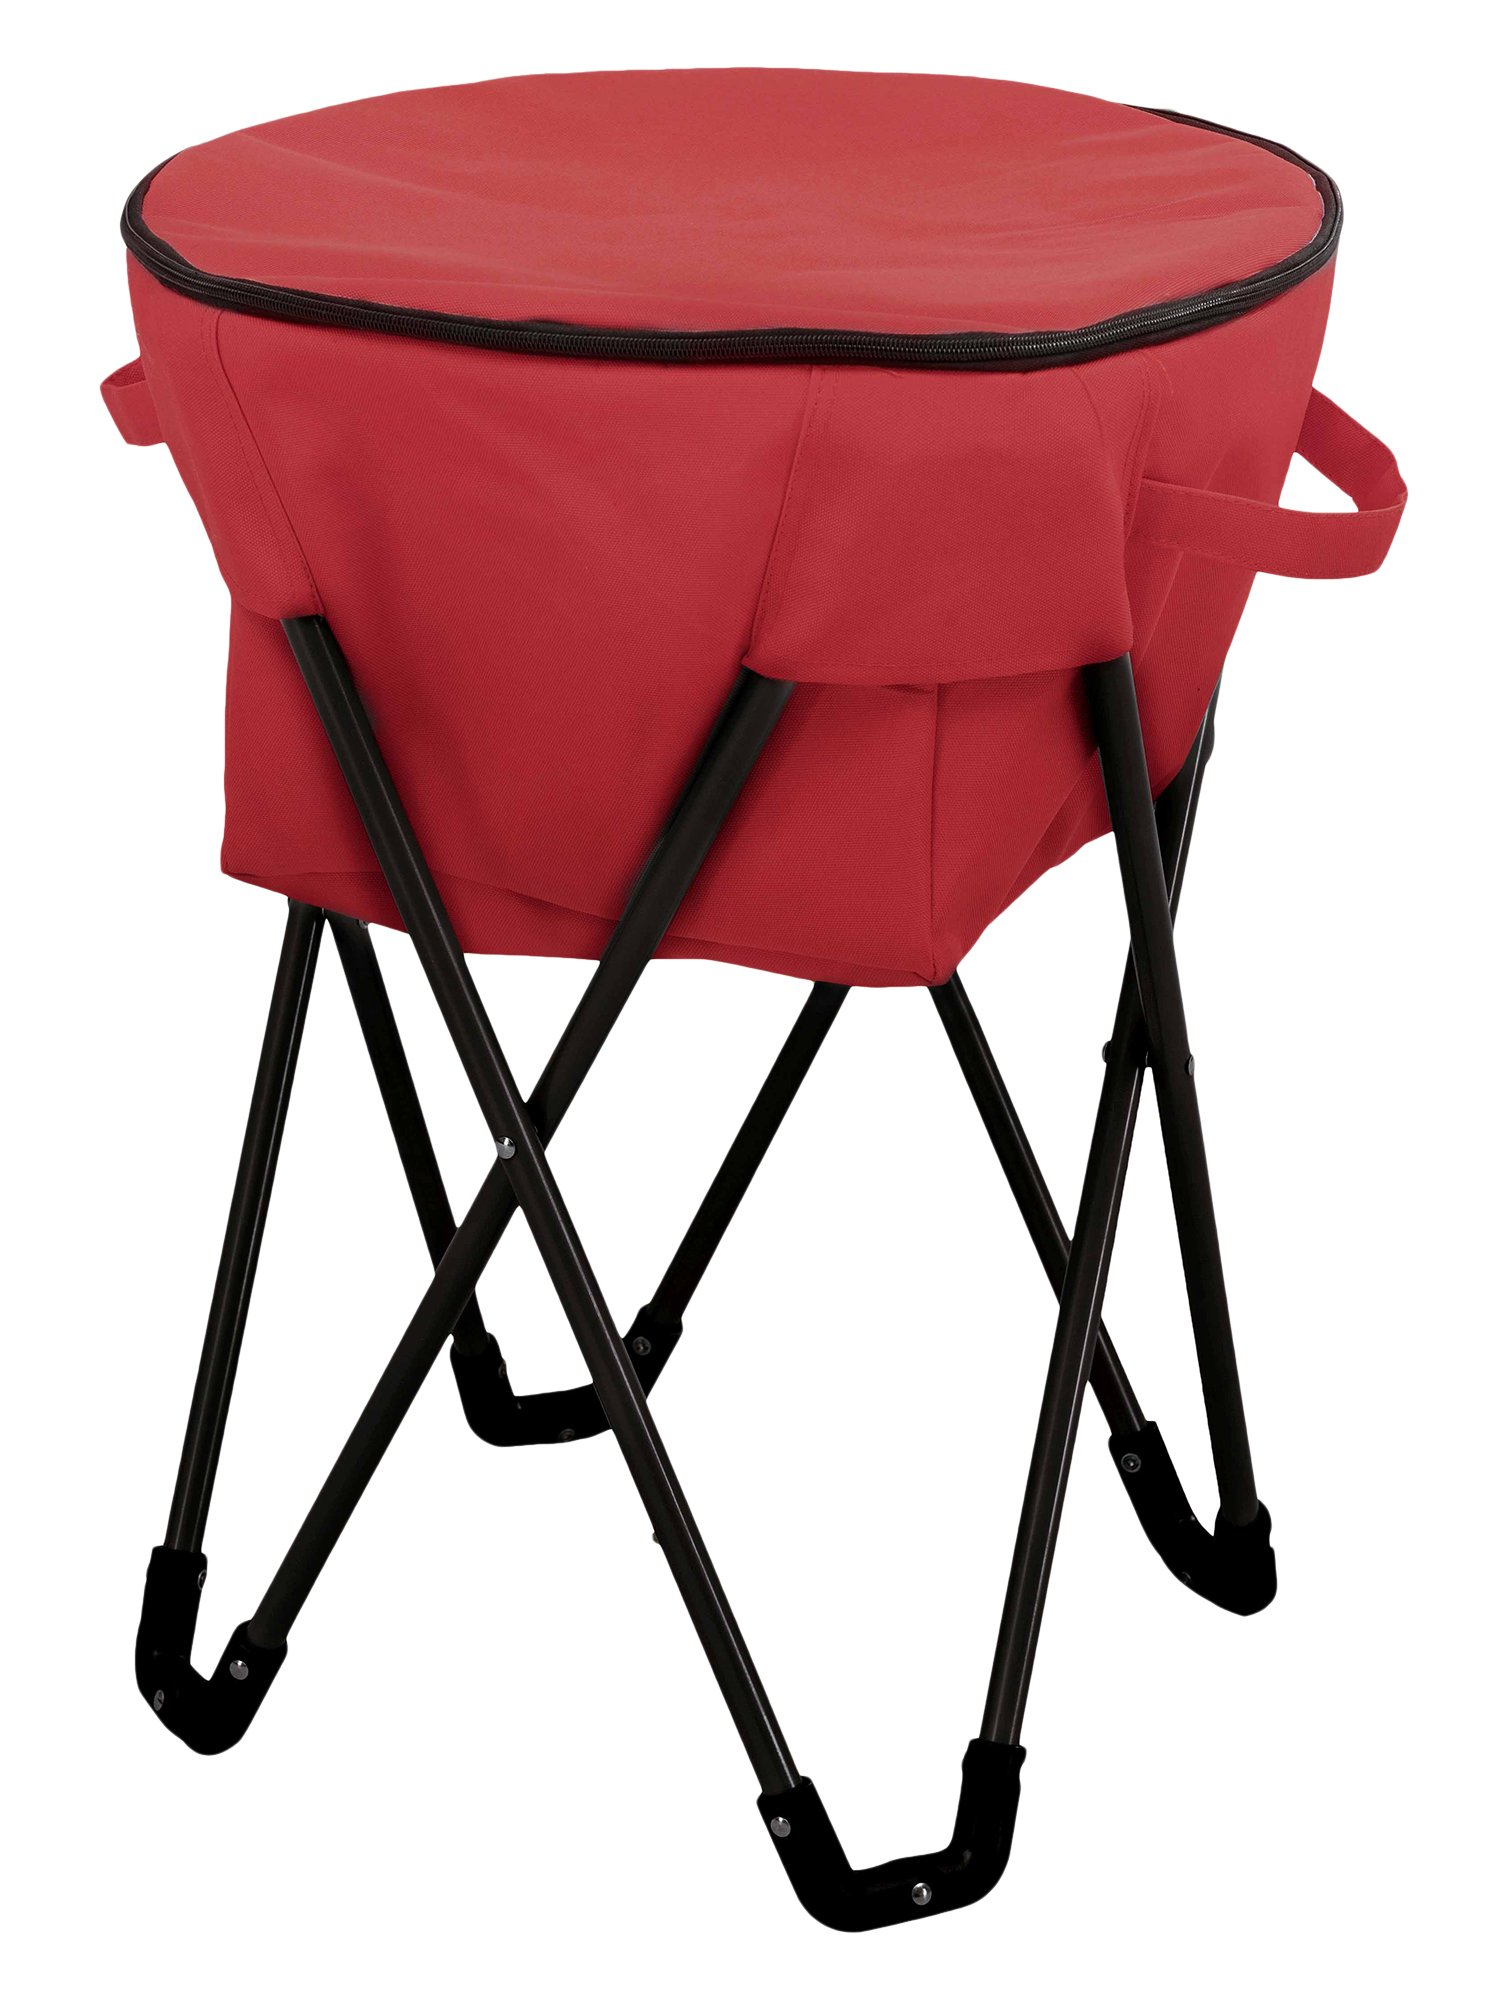 Sunjoy Folding Frame Outdoor Ice Cooler Bag, Red by Sunjoy